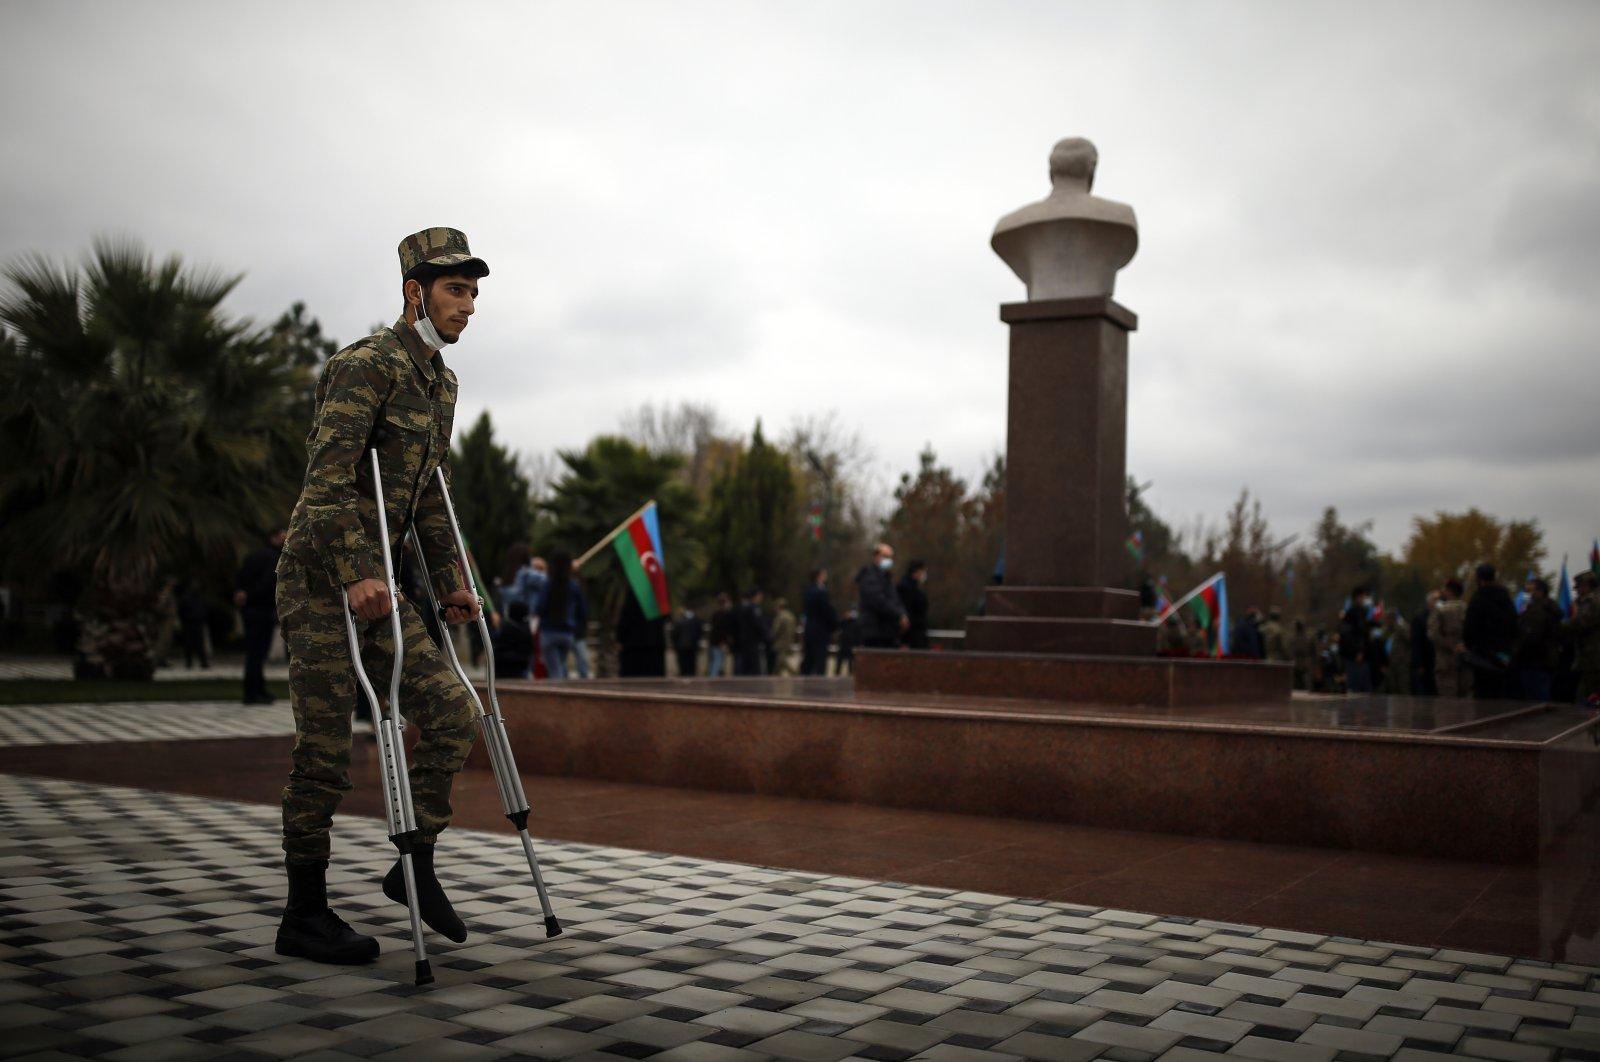 A wounded Azerbaijani soldier stands next to a bust of Azerbaijani President Ilham Aliyev's father and former Azerbaijani President Heydar Aliyev, in Aghjabadi, Azerbaijan, Tuesday, Dec. 1, 2020. (AP File Photo)